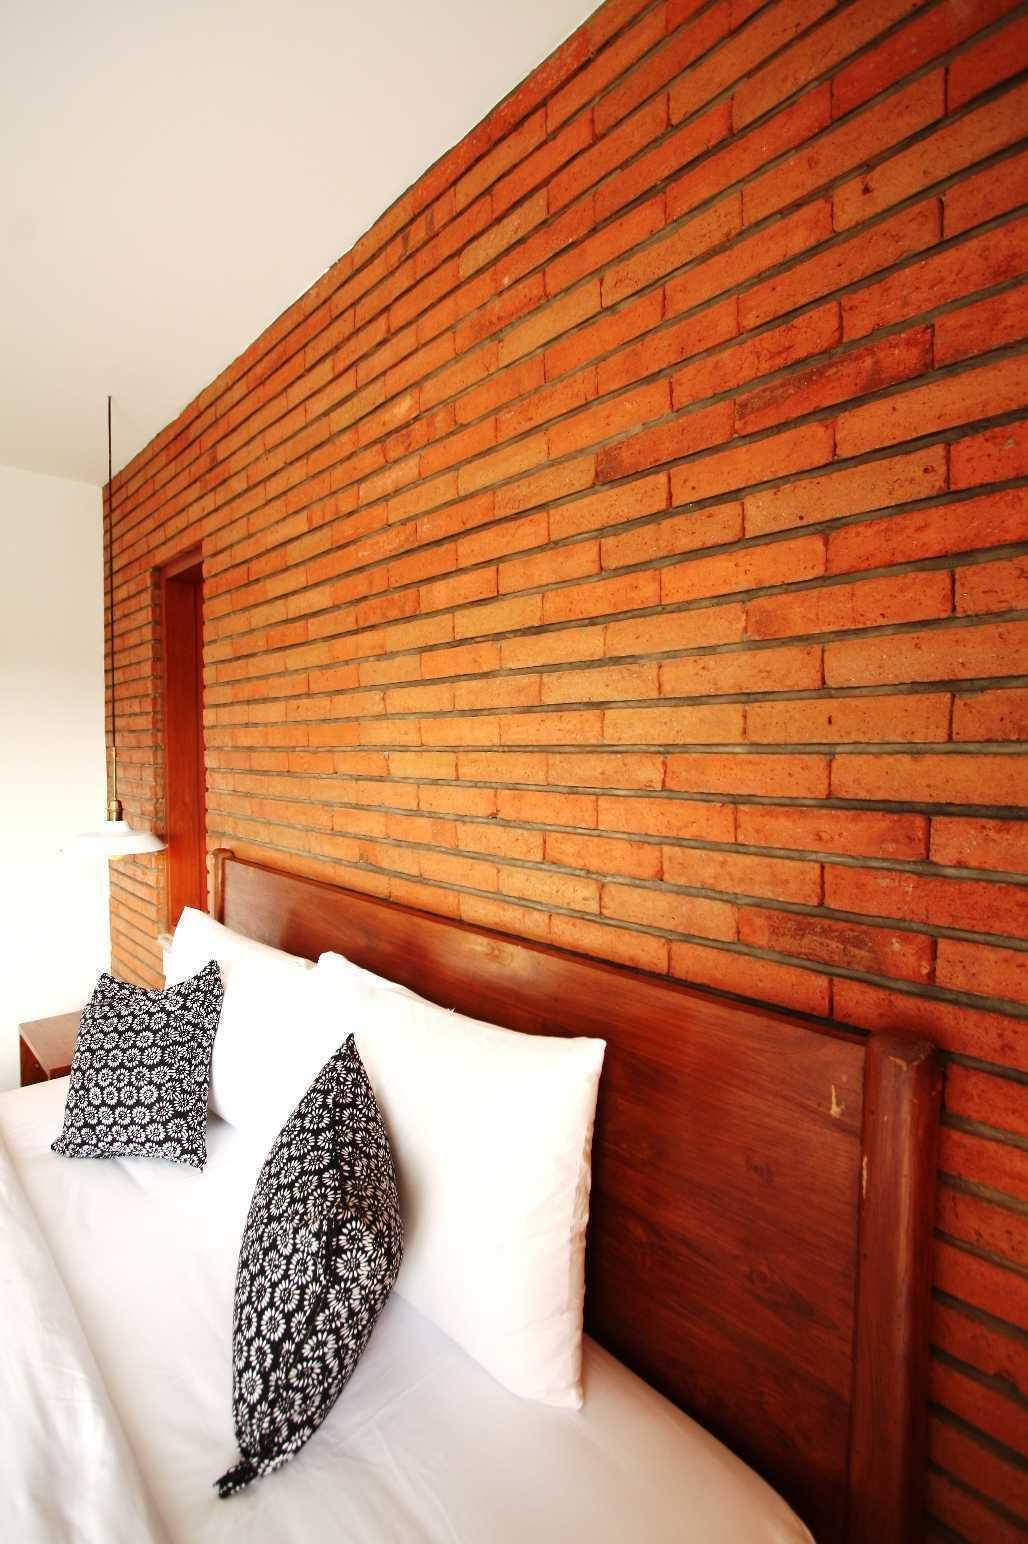 Ddap Architect Kubu Tropis Lodge Accommodation Ubud, Kabupaten Gianyar, Bali, Indonesia Bali Img0709 Tropis  28527